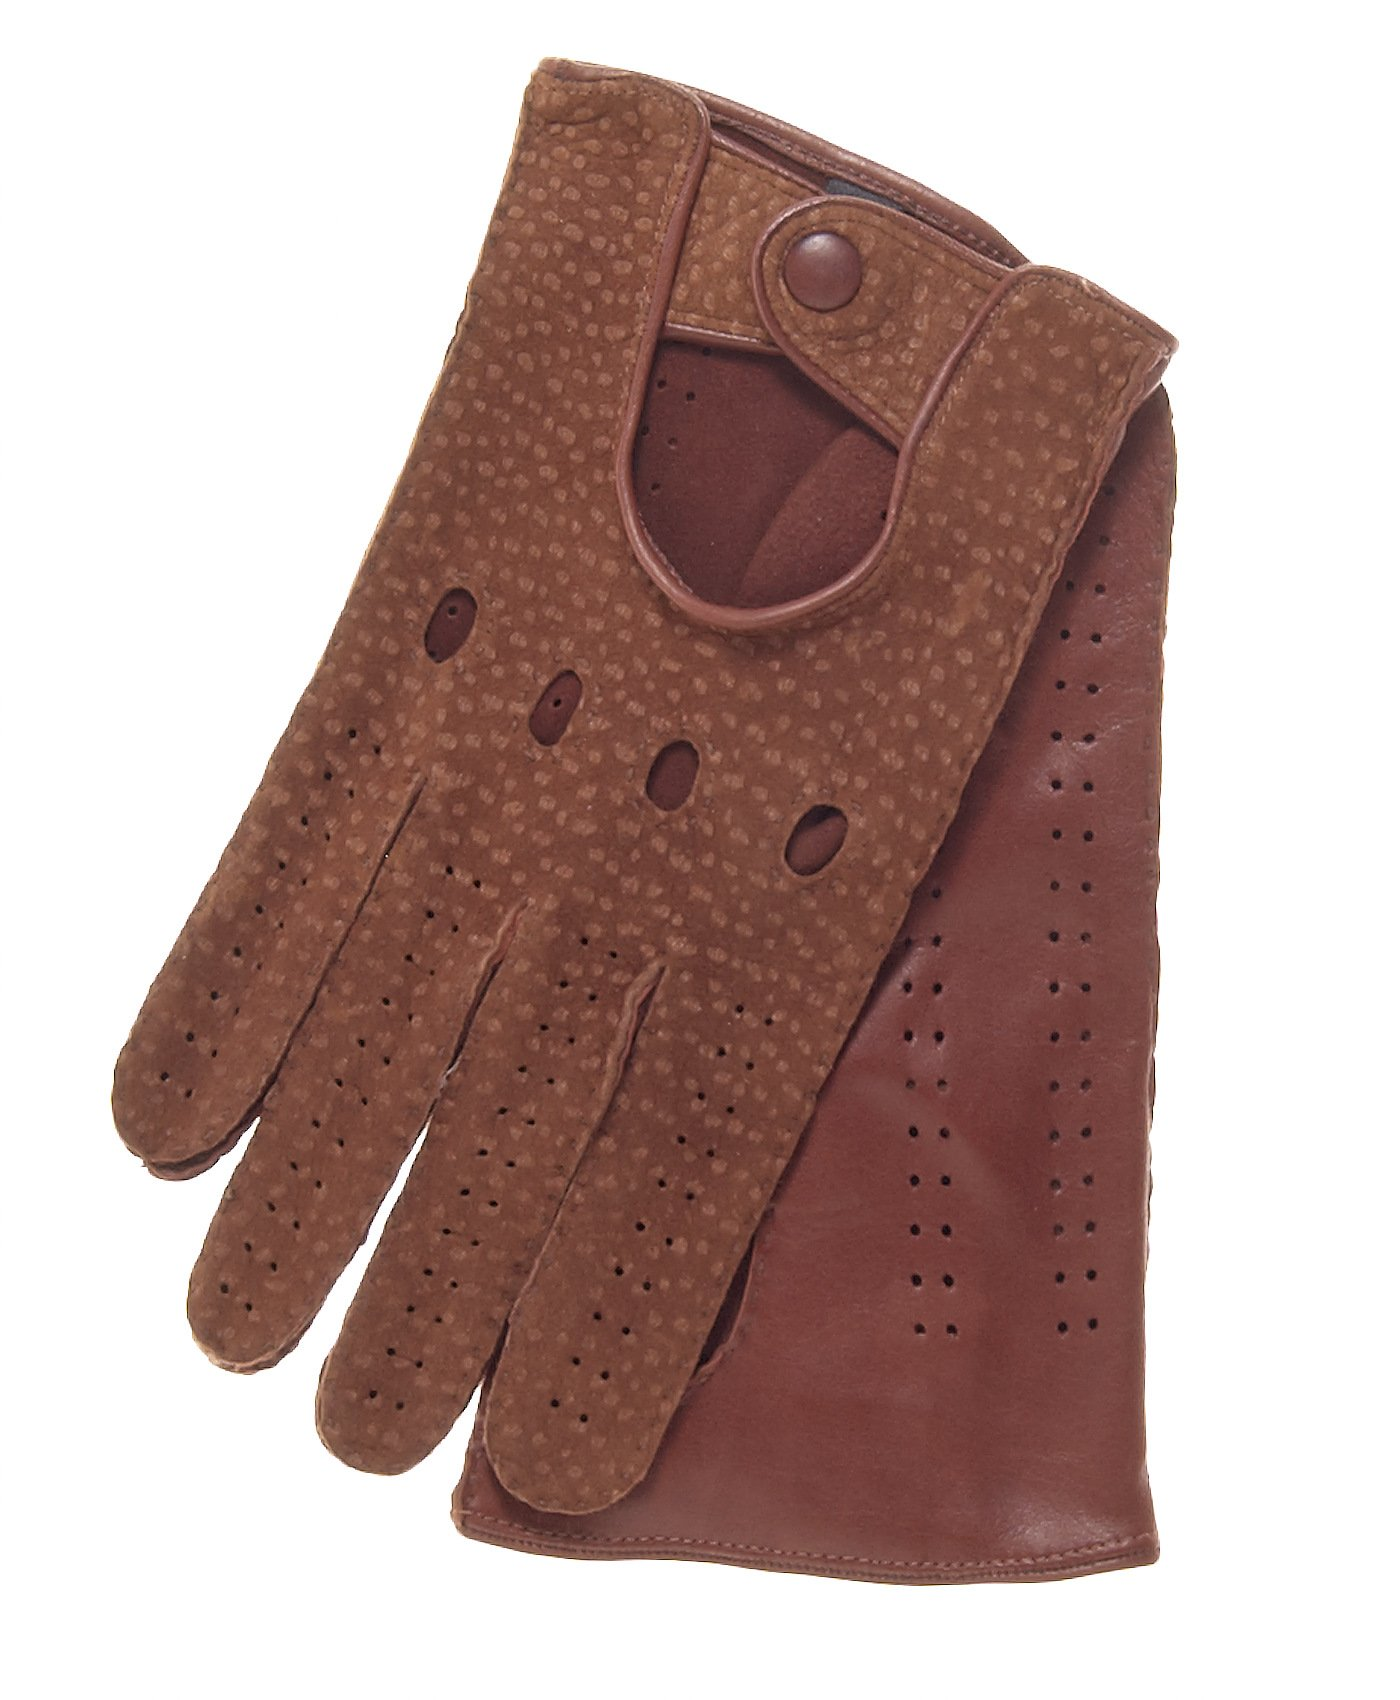 Fratelli Orsini Men's Handsewn Italian Carpincho Driving Gloves Size 10 Color Cork